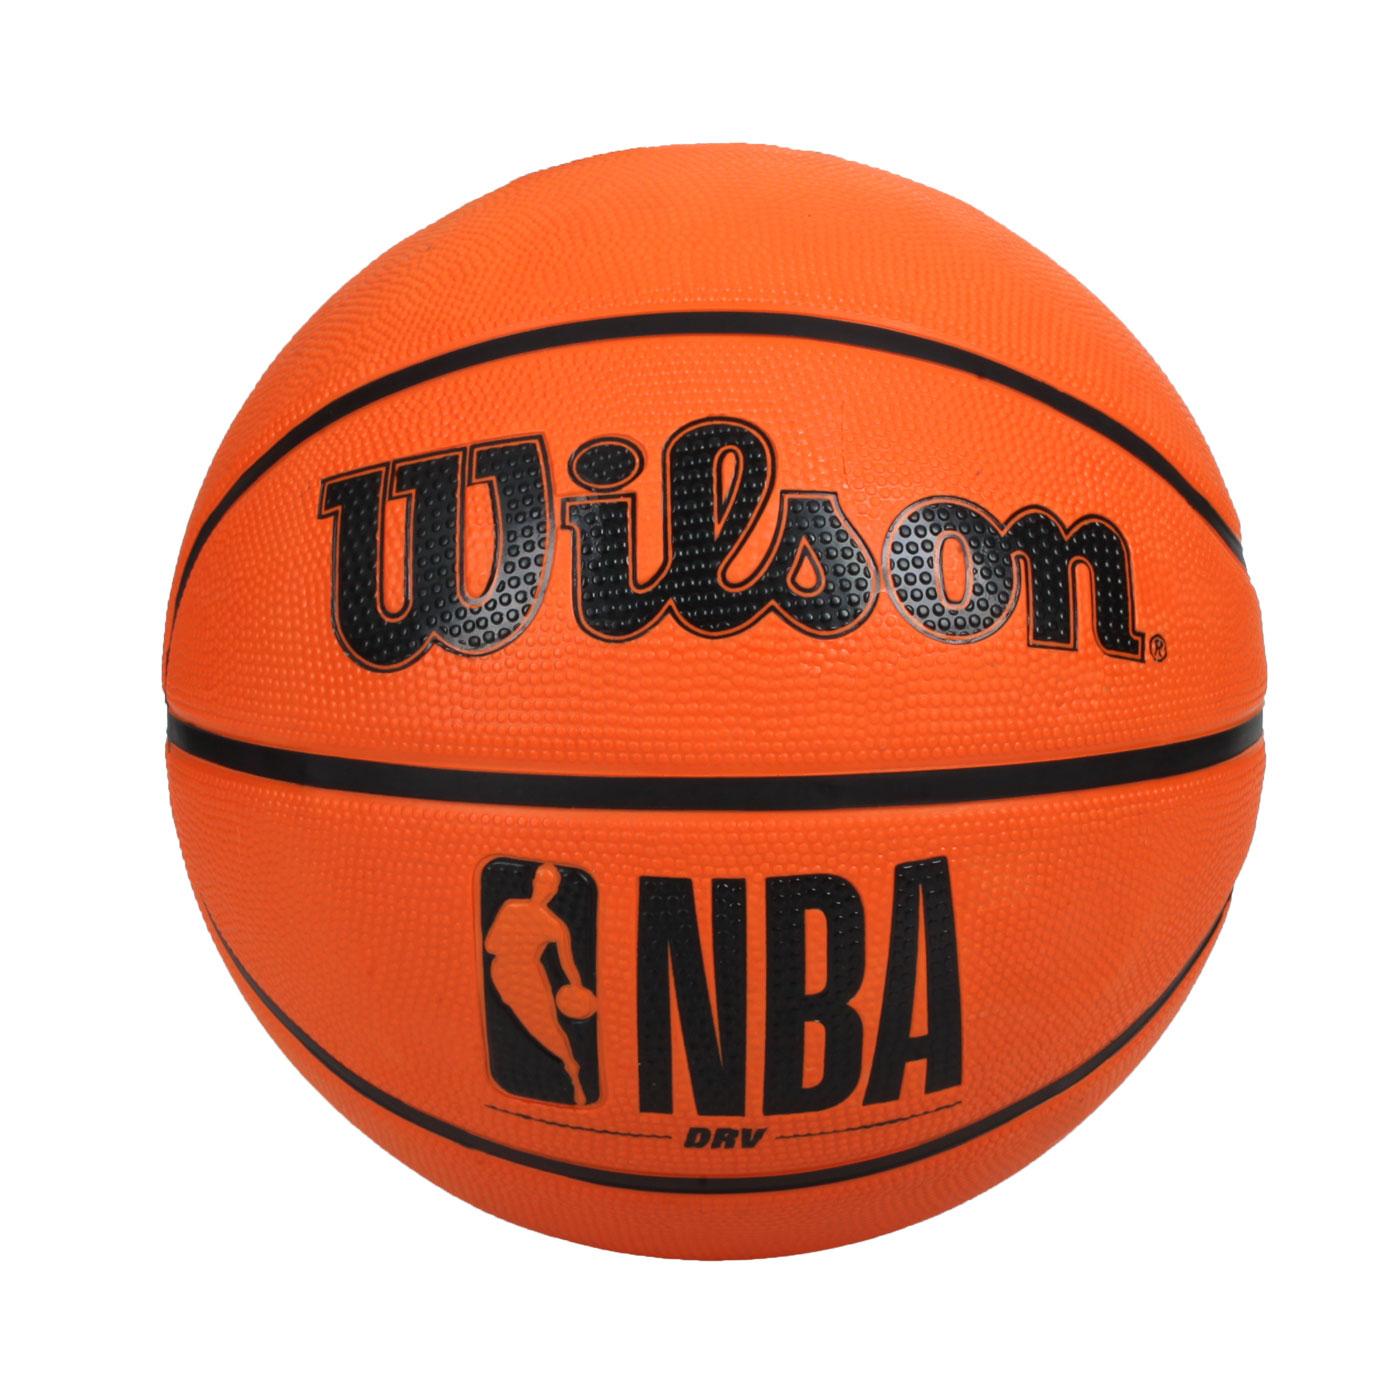 WILSON NBA DRV系列橡膠籃球#6 WTB9300XB06